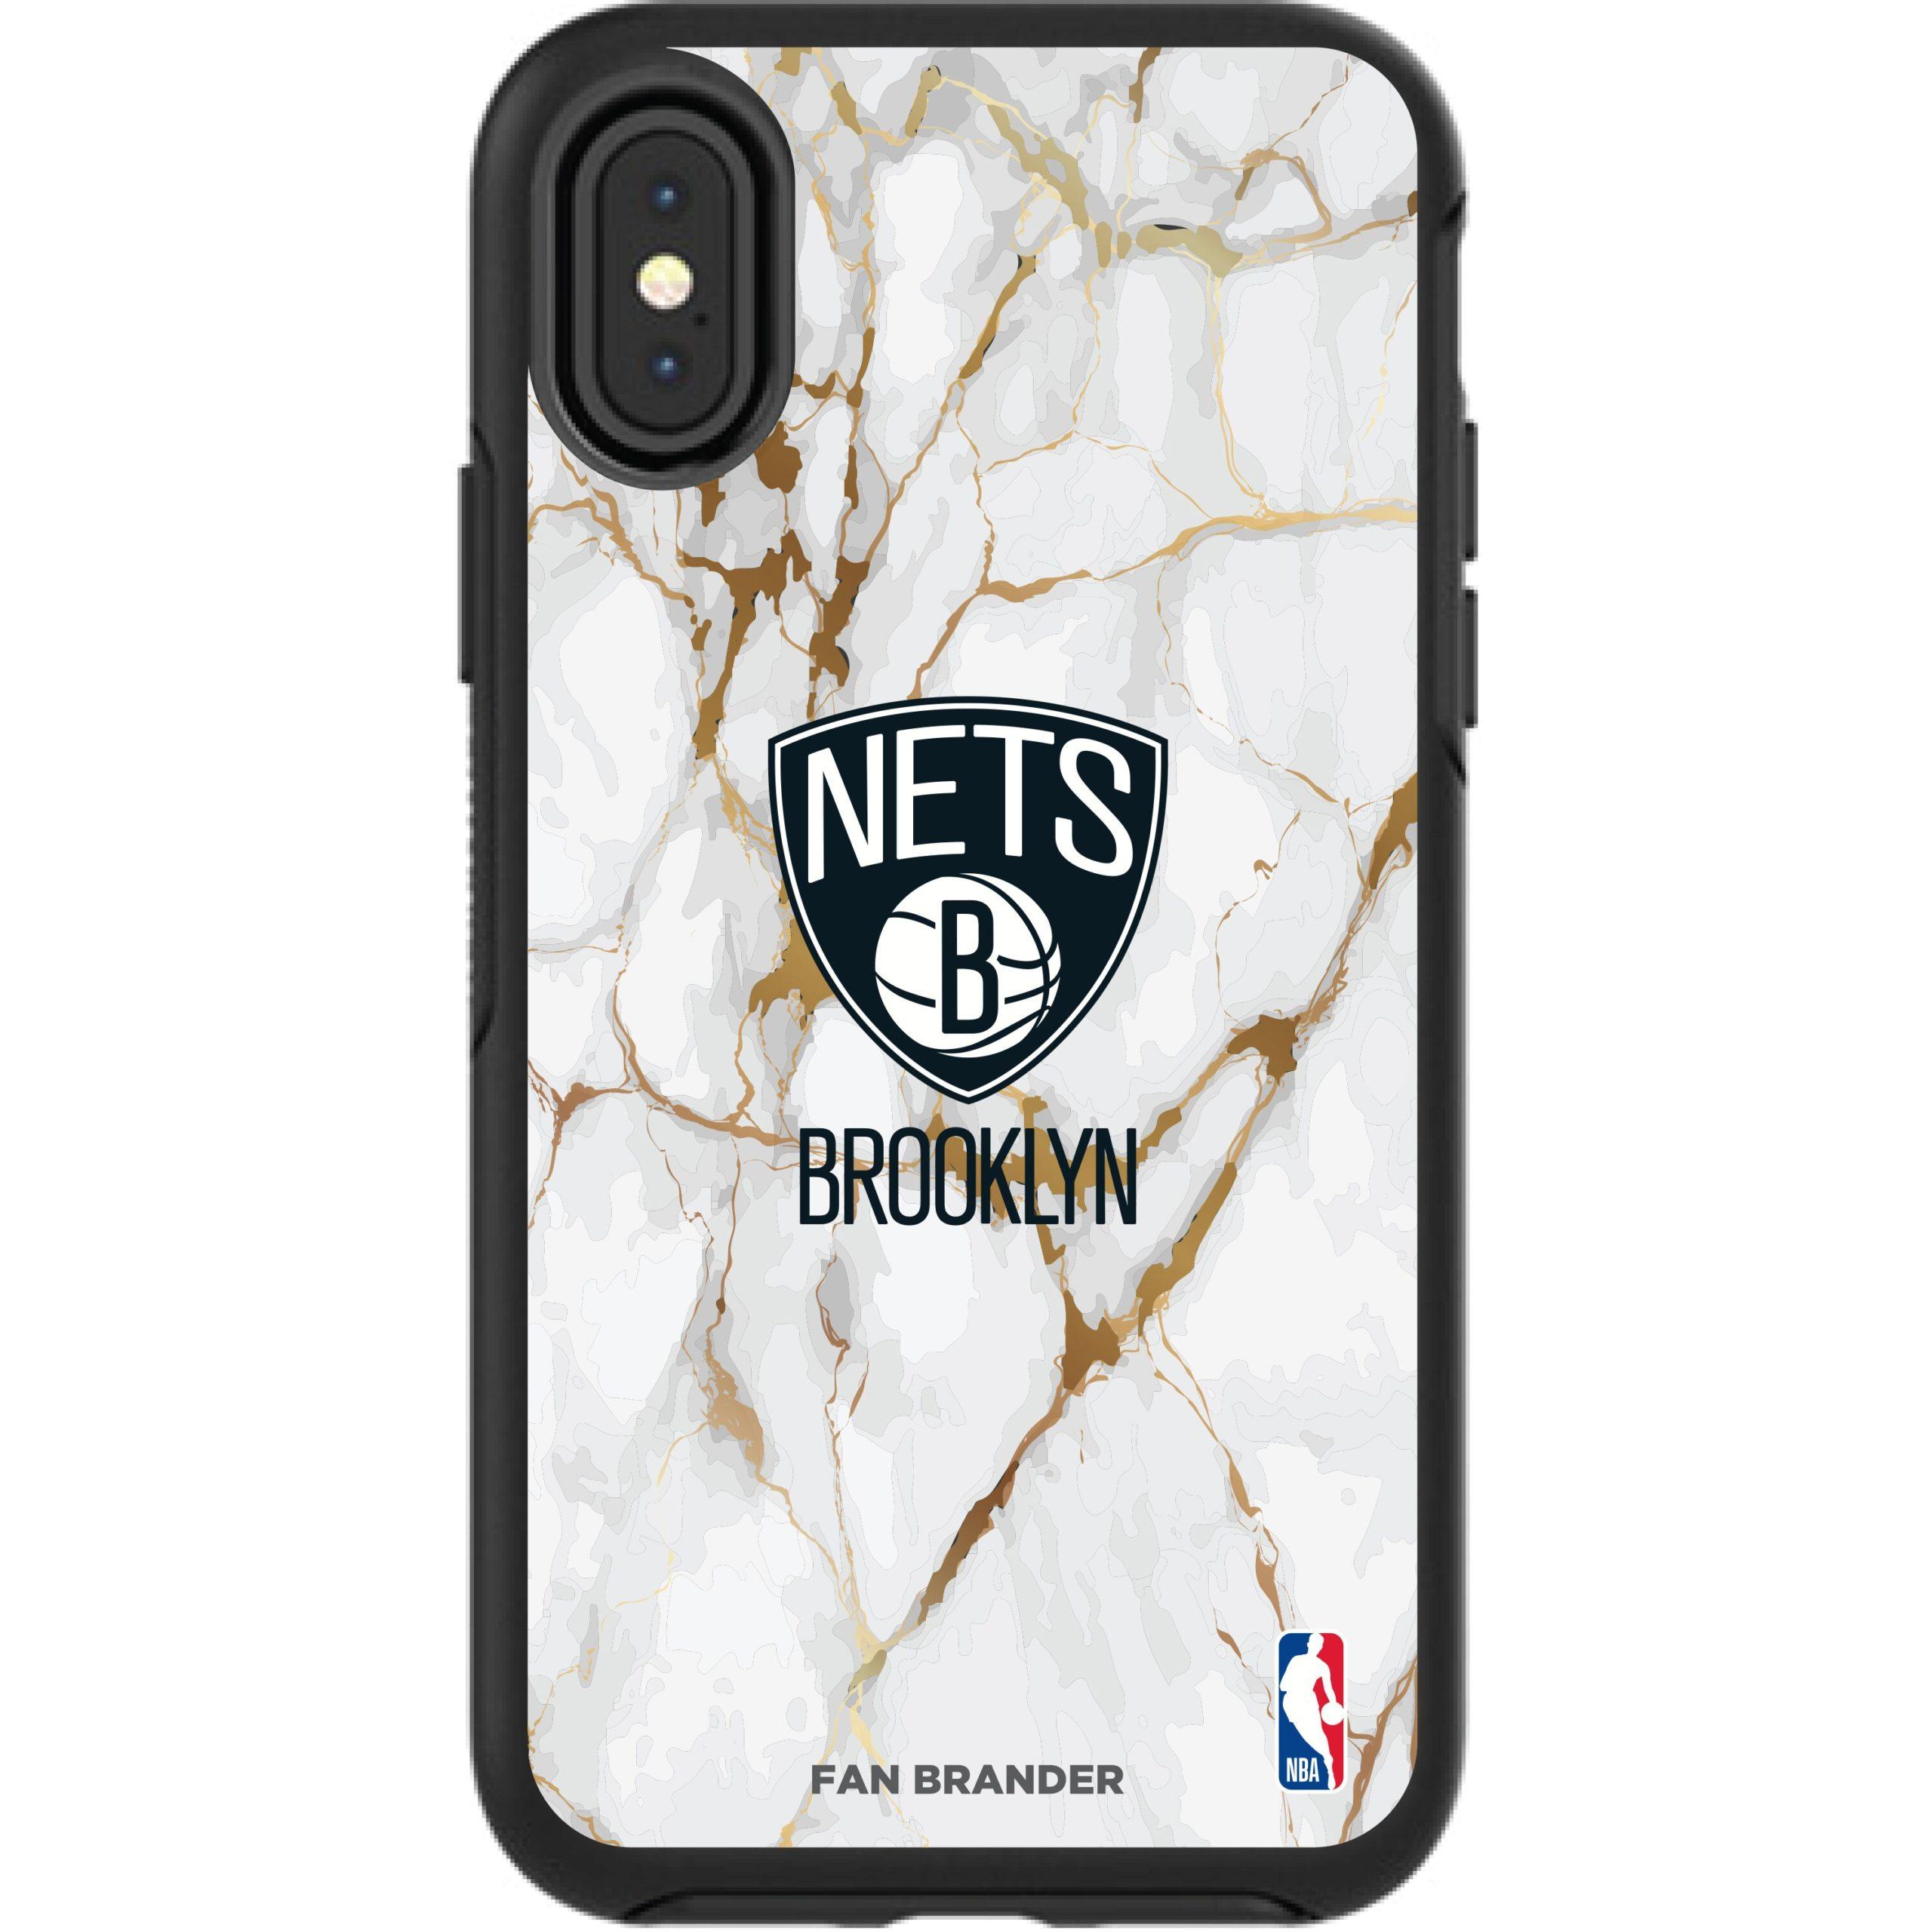 Brooklyn Nets iPhone Symmetry Marble Case - Black